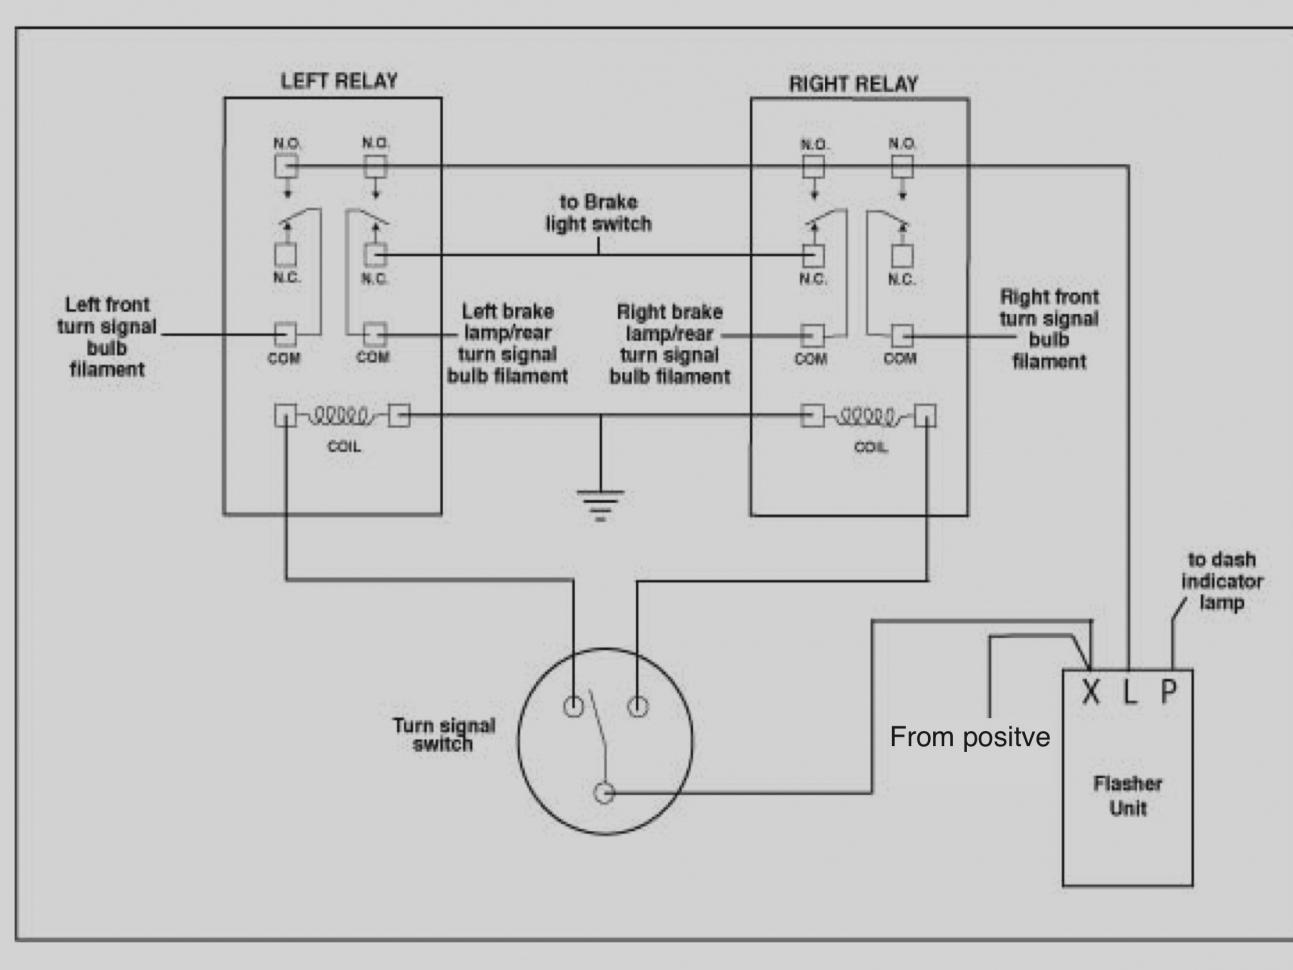 2009 Polaris Rzr 800 Wiring Diagram Wiring Diagram Data Today